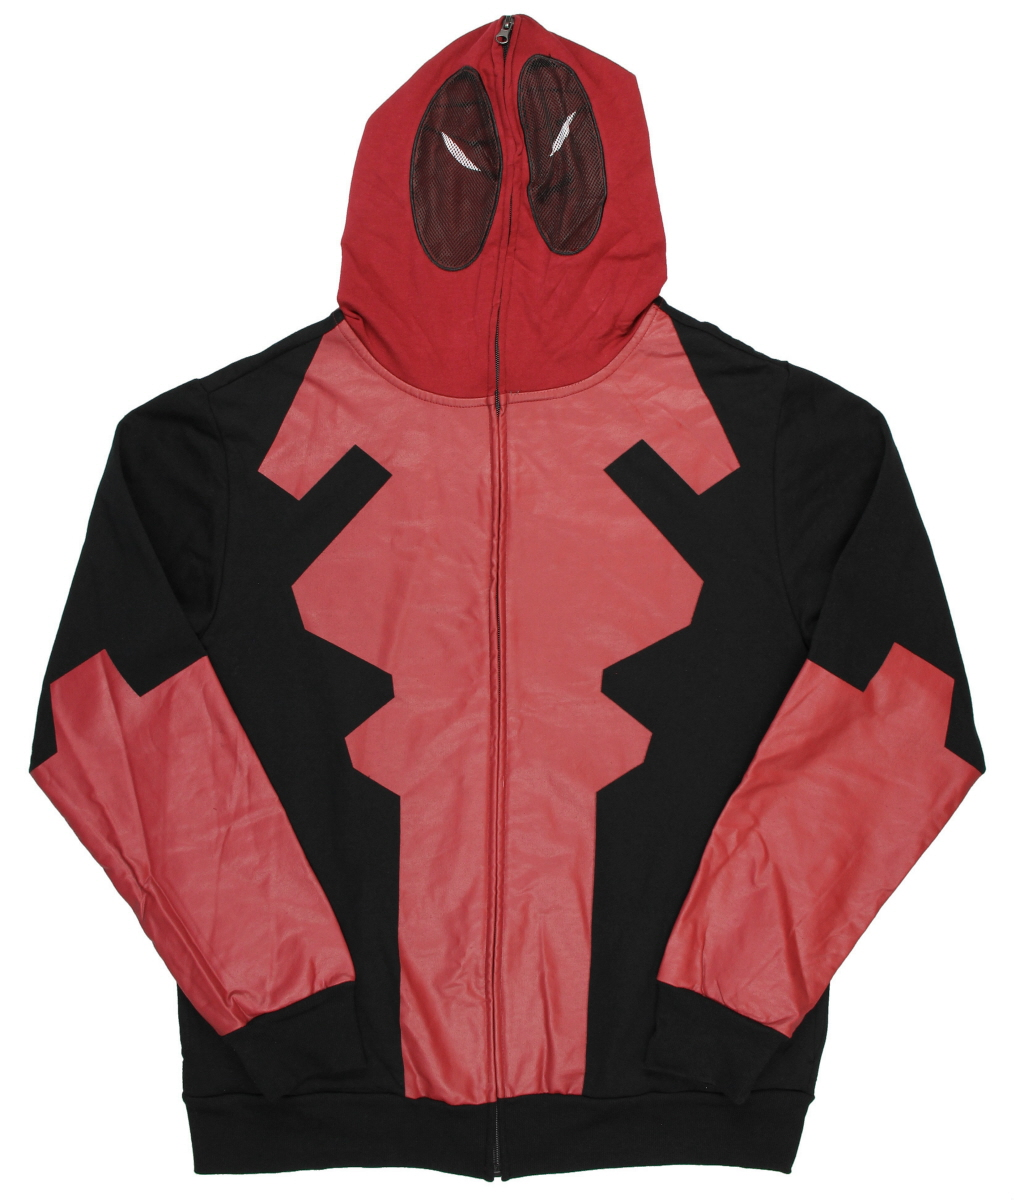 Marvel Deadpool Costume Zip Up Hoodie Sweatshirt